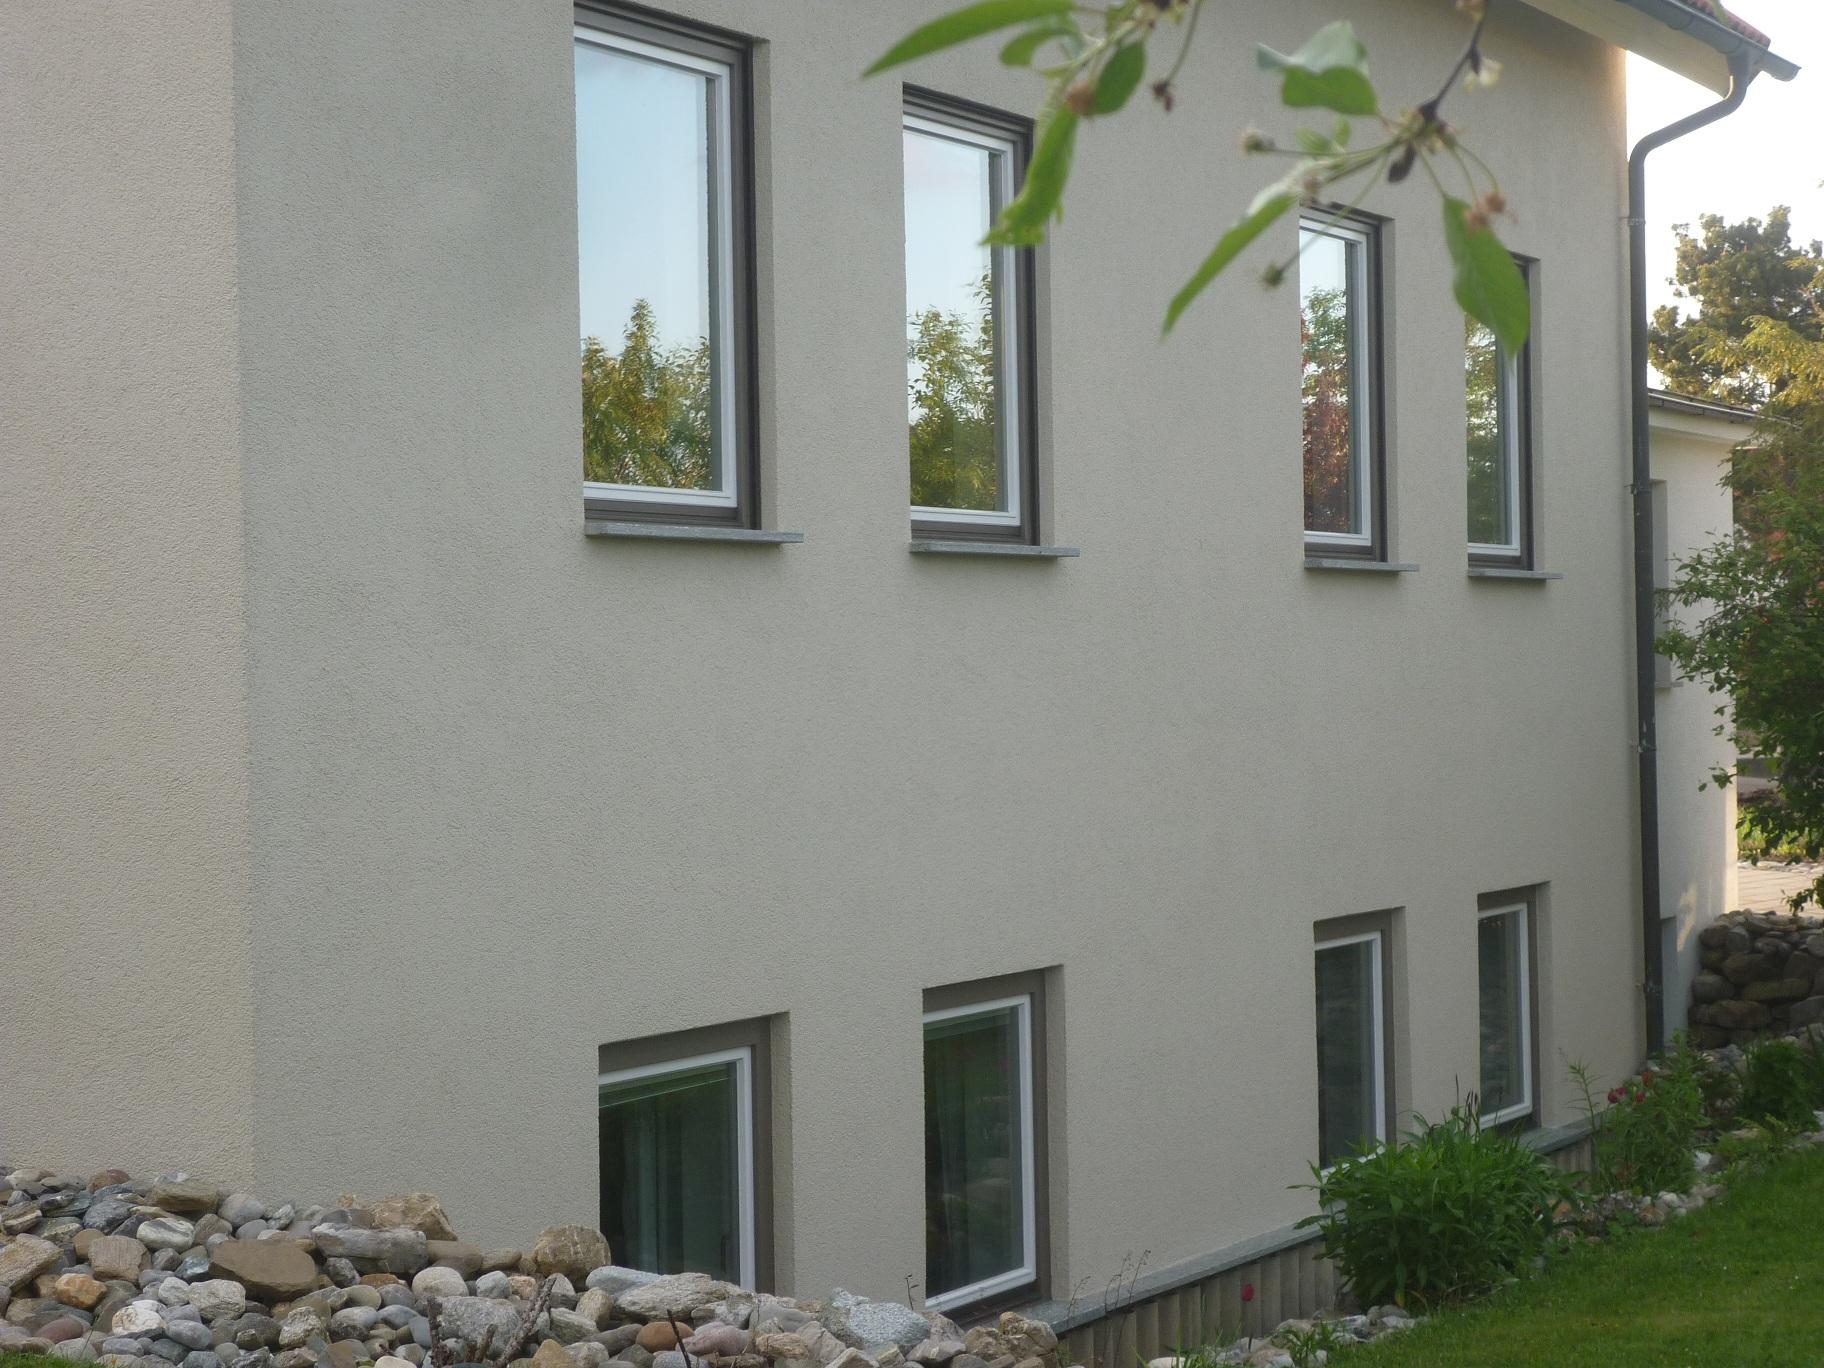 Neubau eines Zweifamilienhauses in BadSaulgau